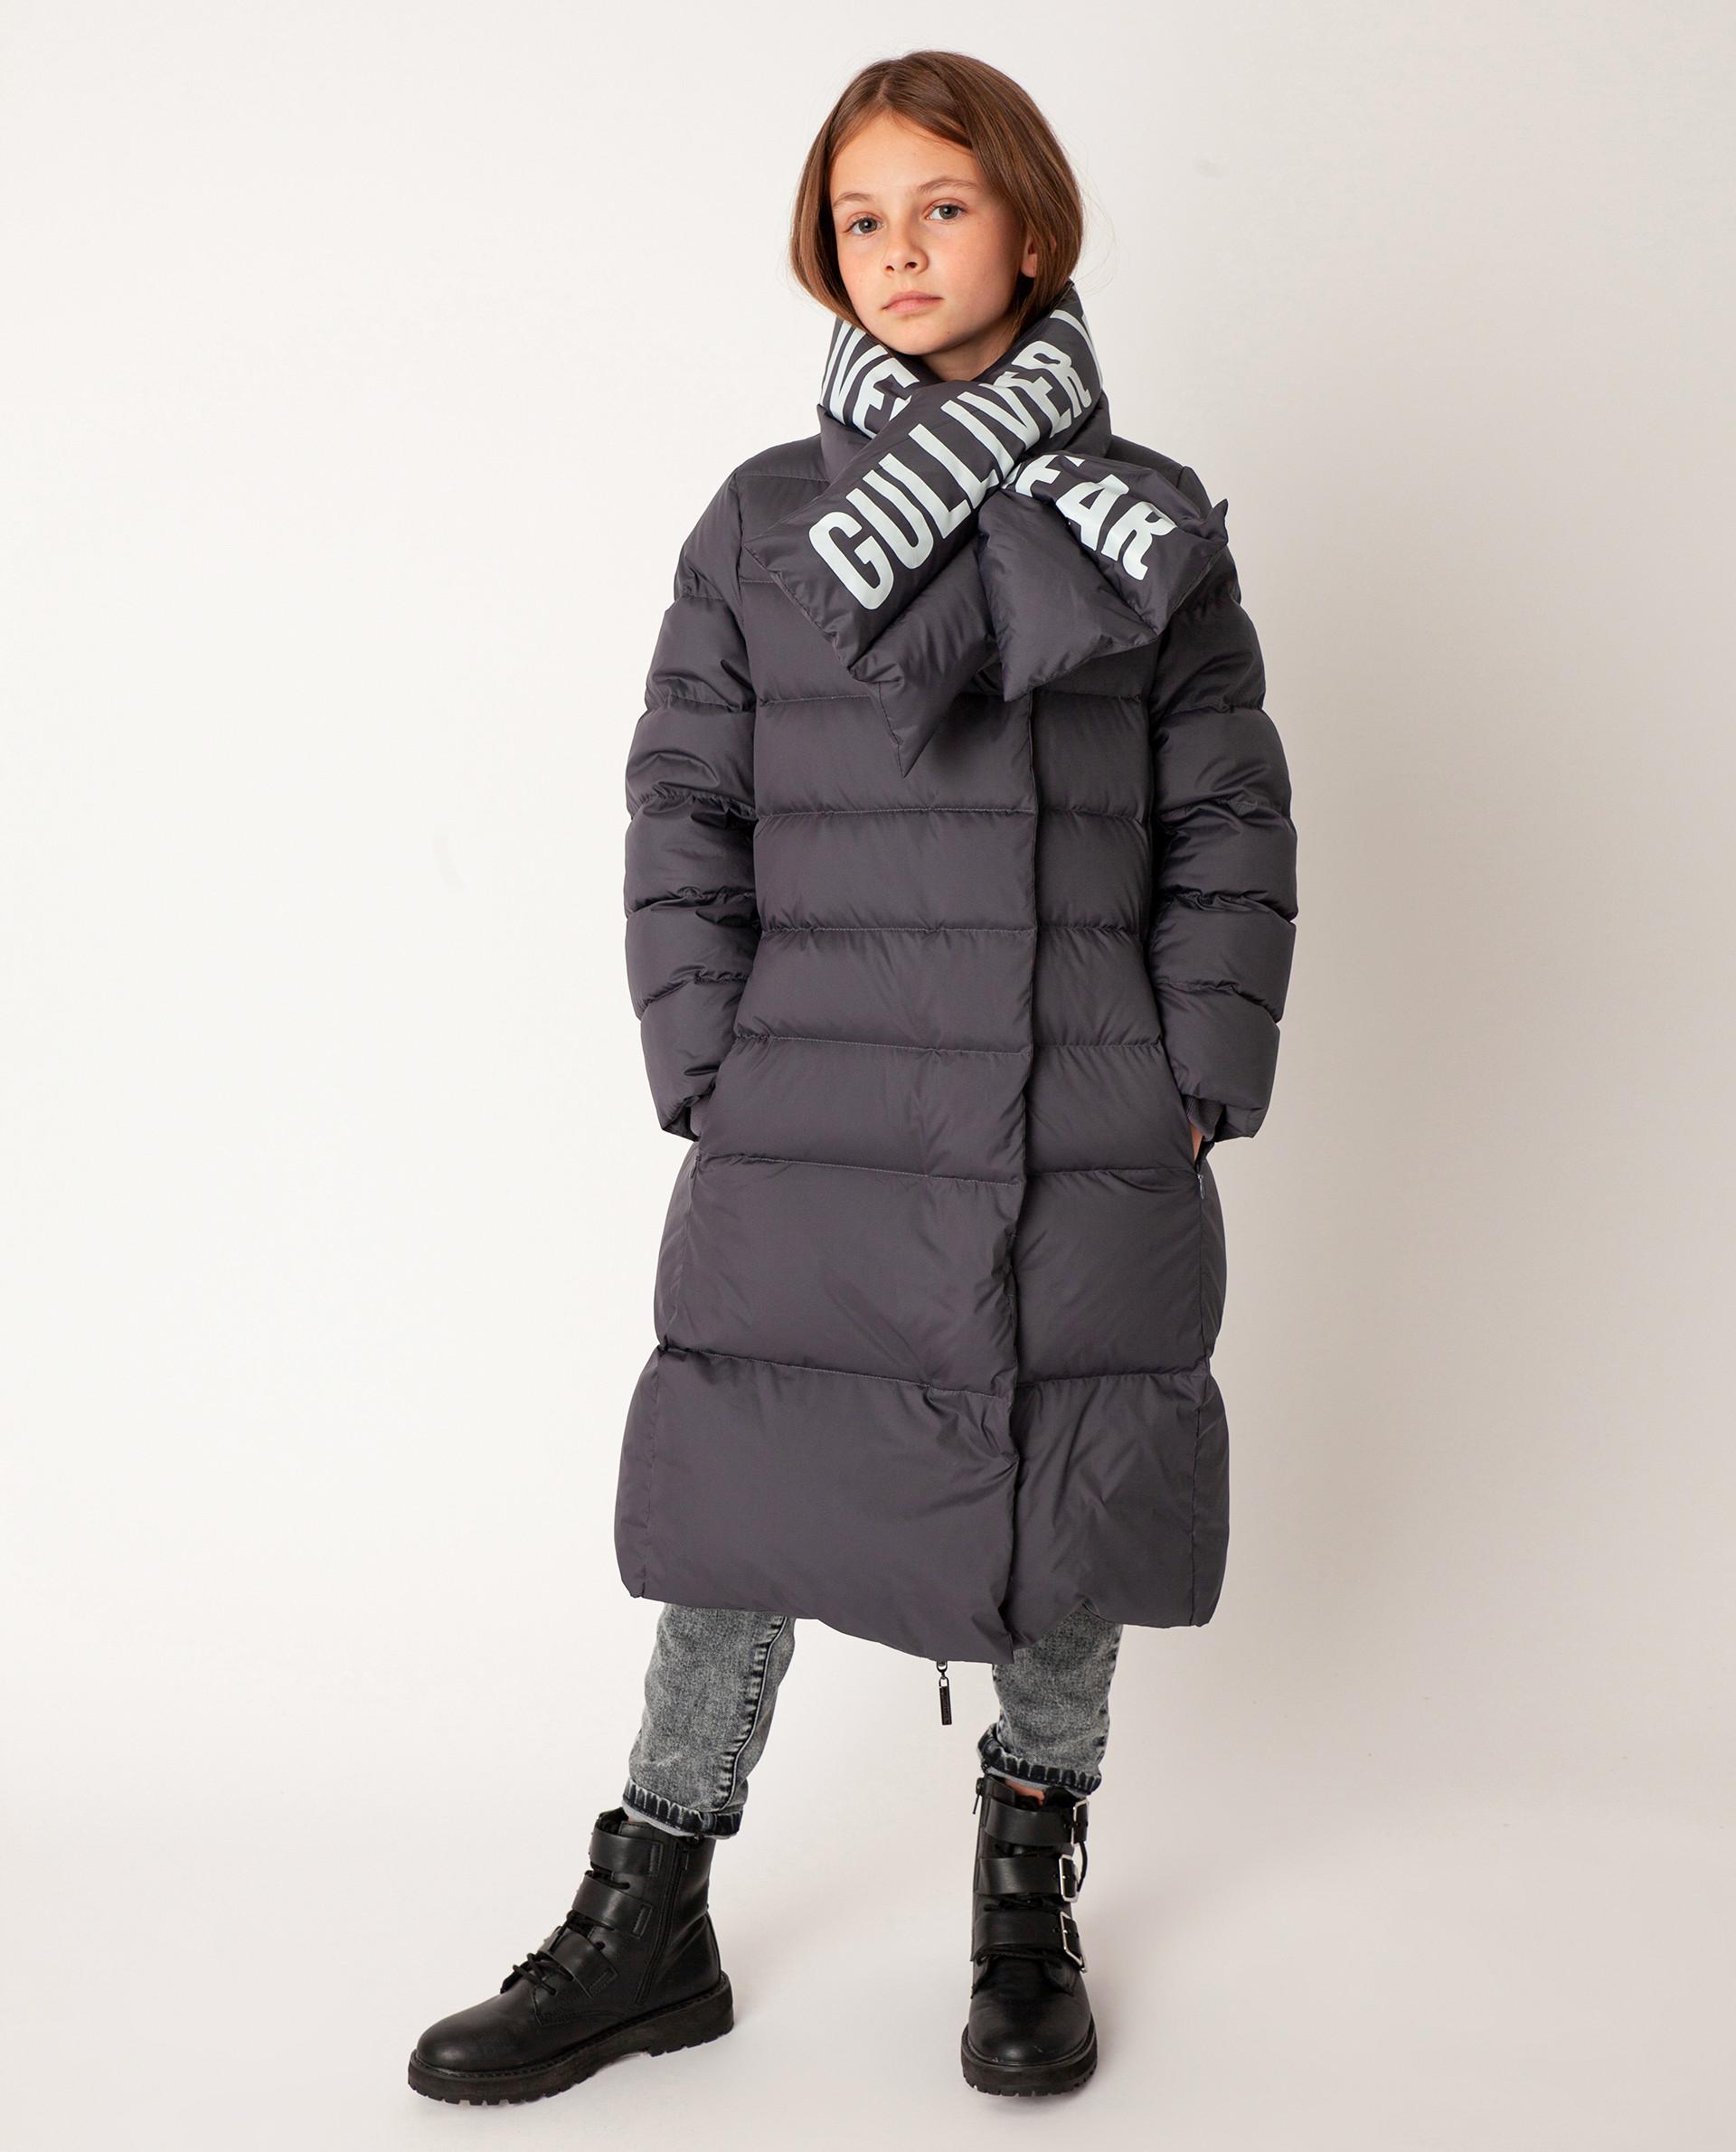 Серое пальто зимнее Gulliver размер 146 22008GJC4511